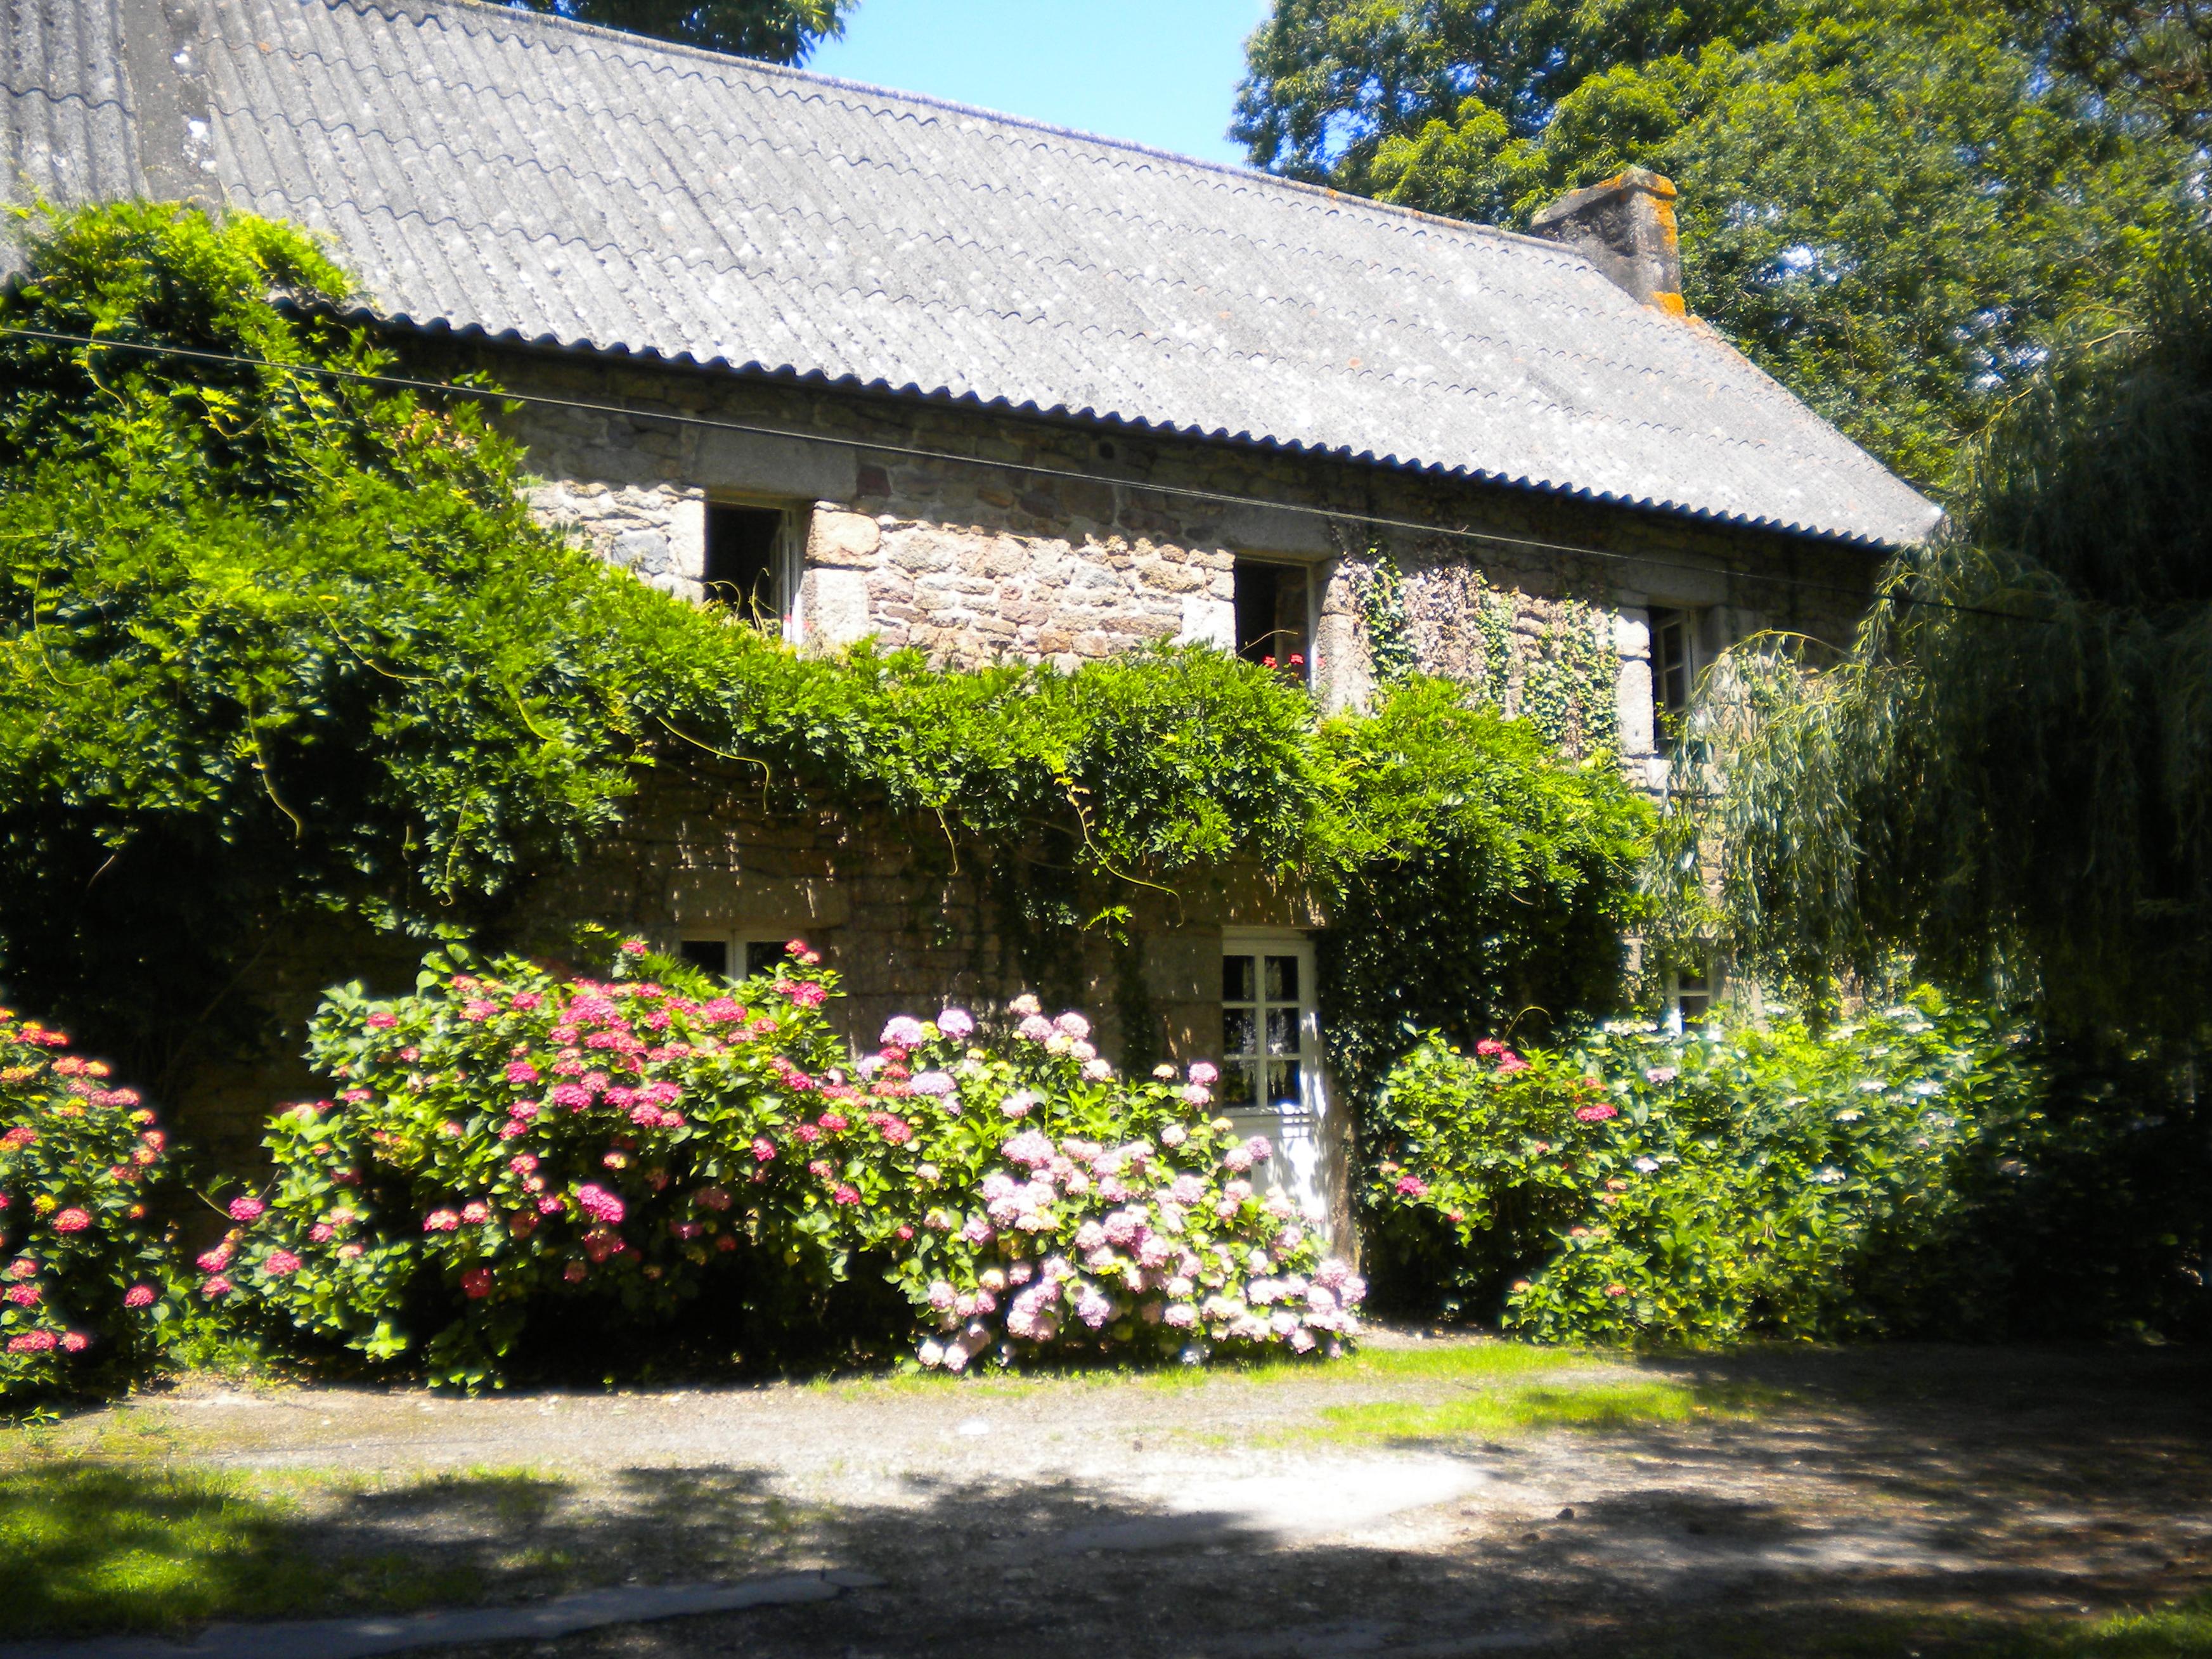 Chambres d'Hotes à Hennebont, Morbihan, Bretagne Sud